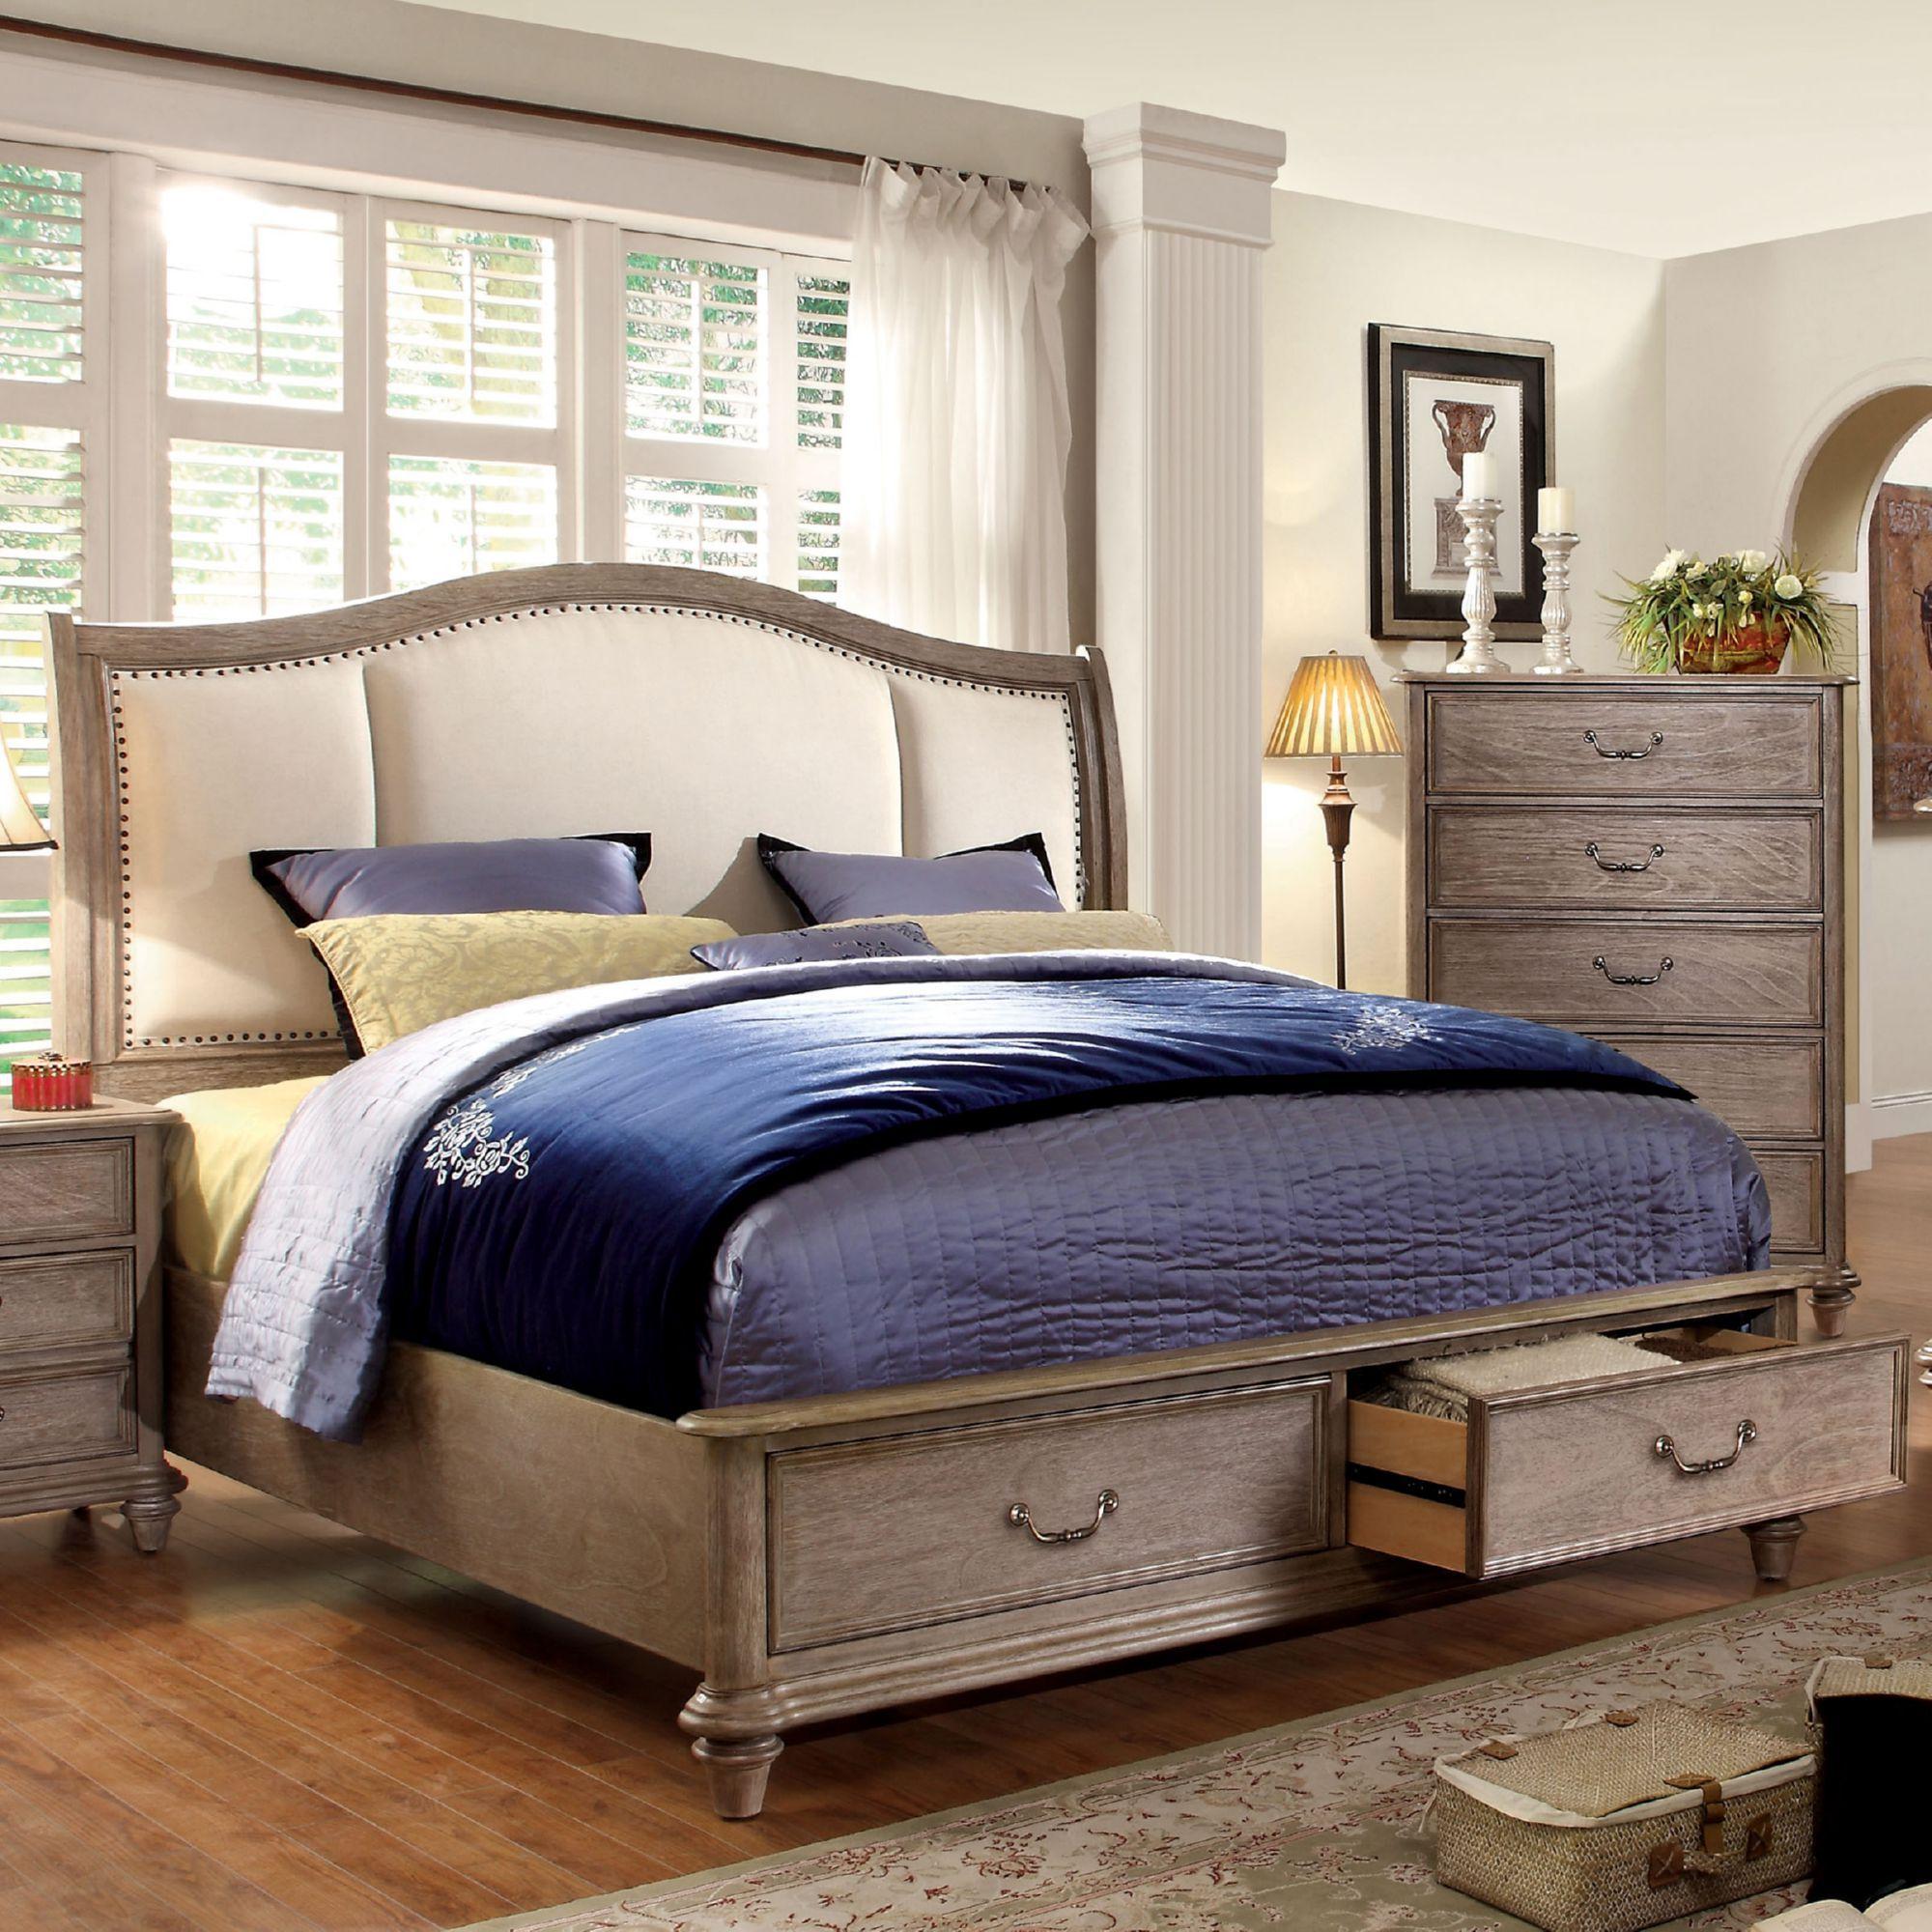 Furniture Of America Welton Rustic Storage Platform Bed W Fabric